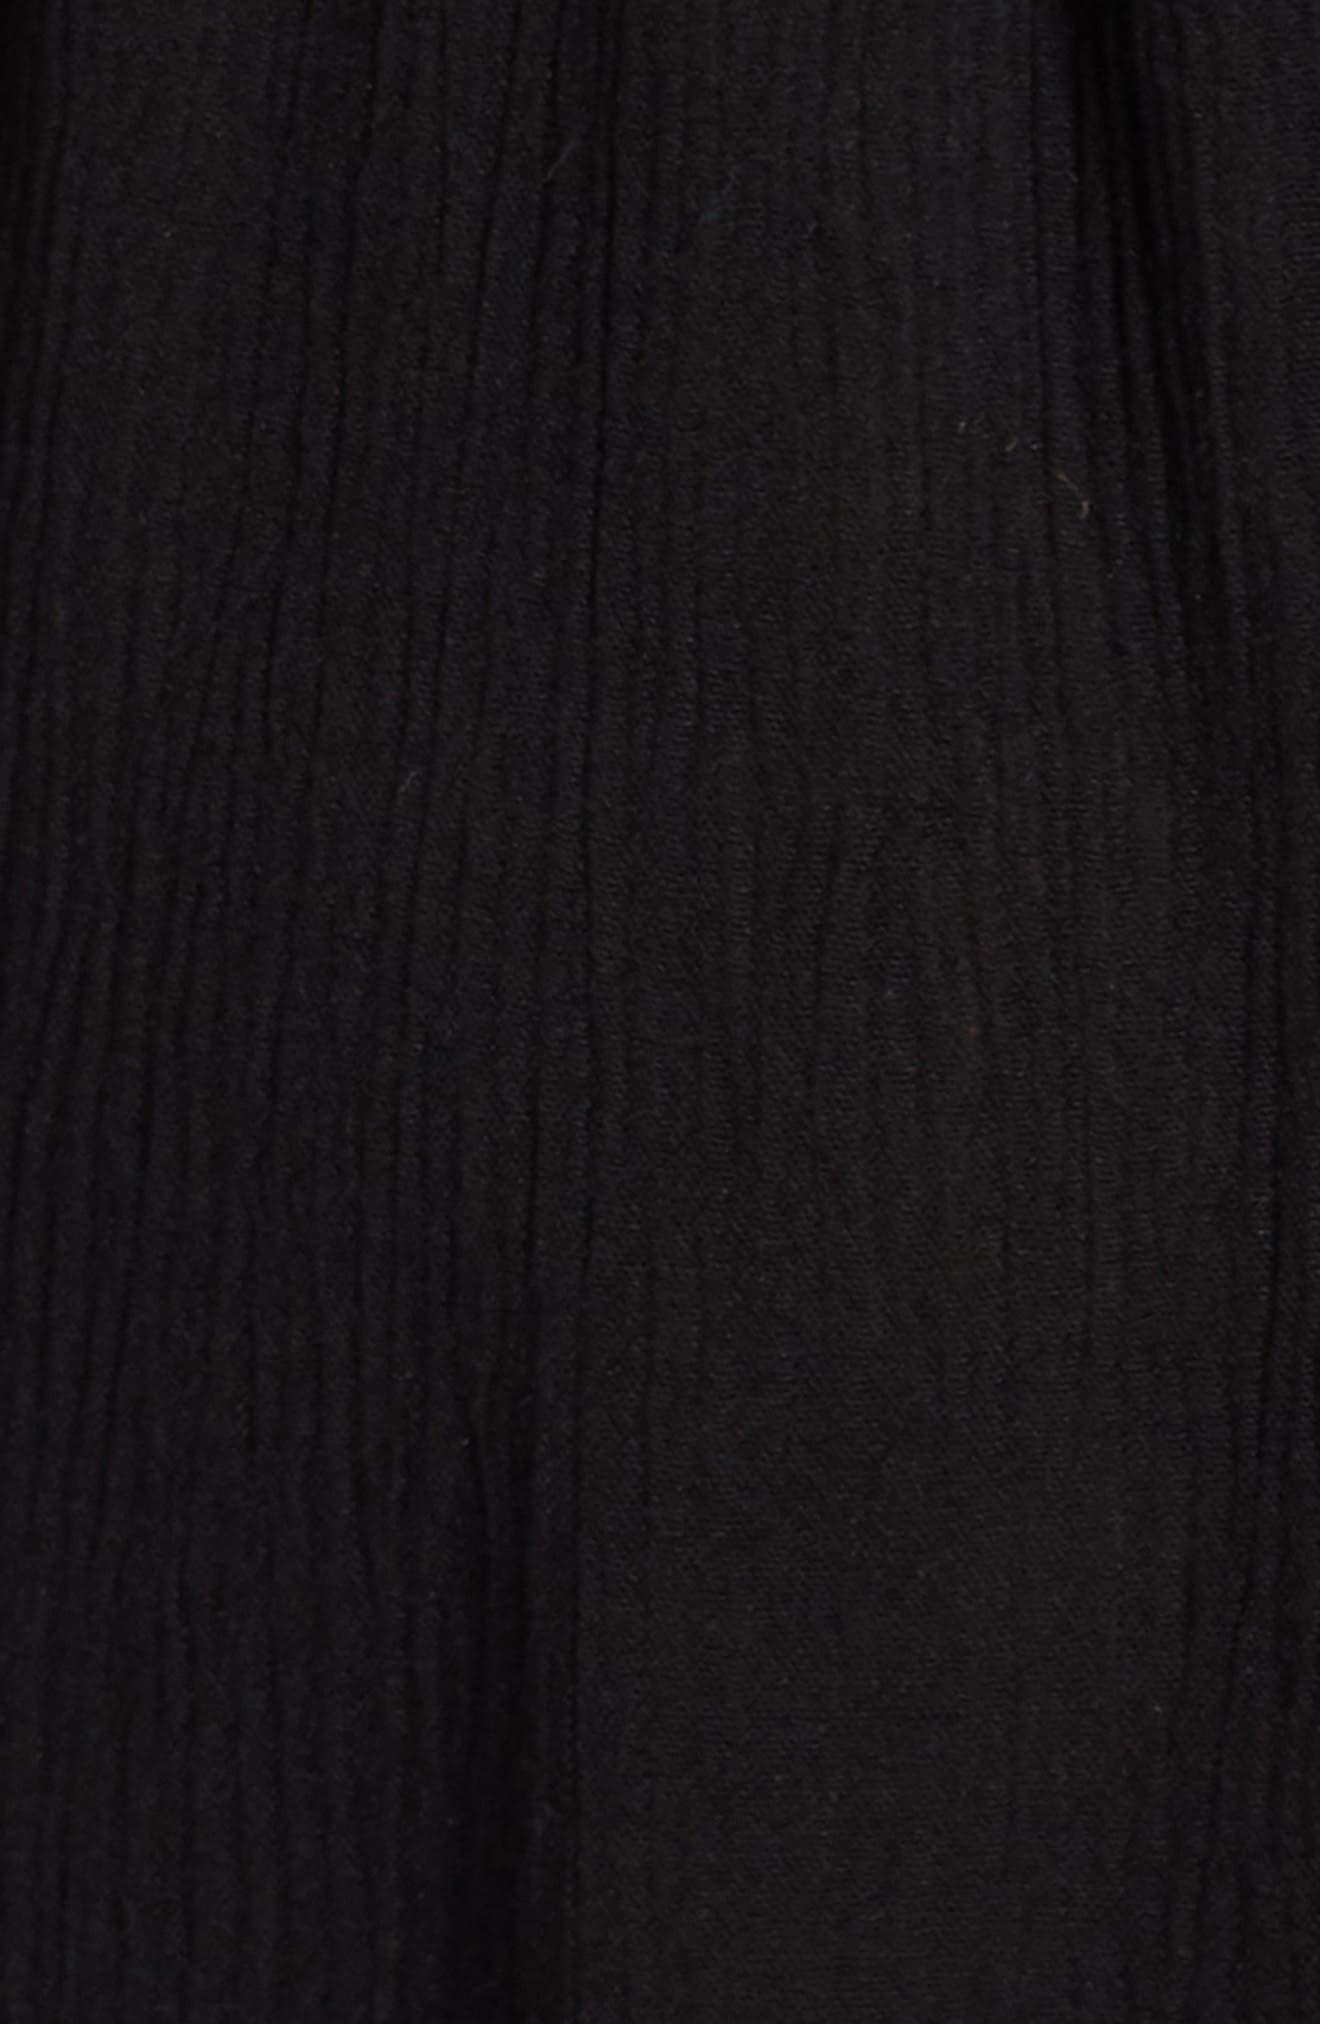 Summer Breeze Off the Shoulder Cover-Up Dress,                             Alternate thumbnail 5, color,                             BLACK